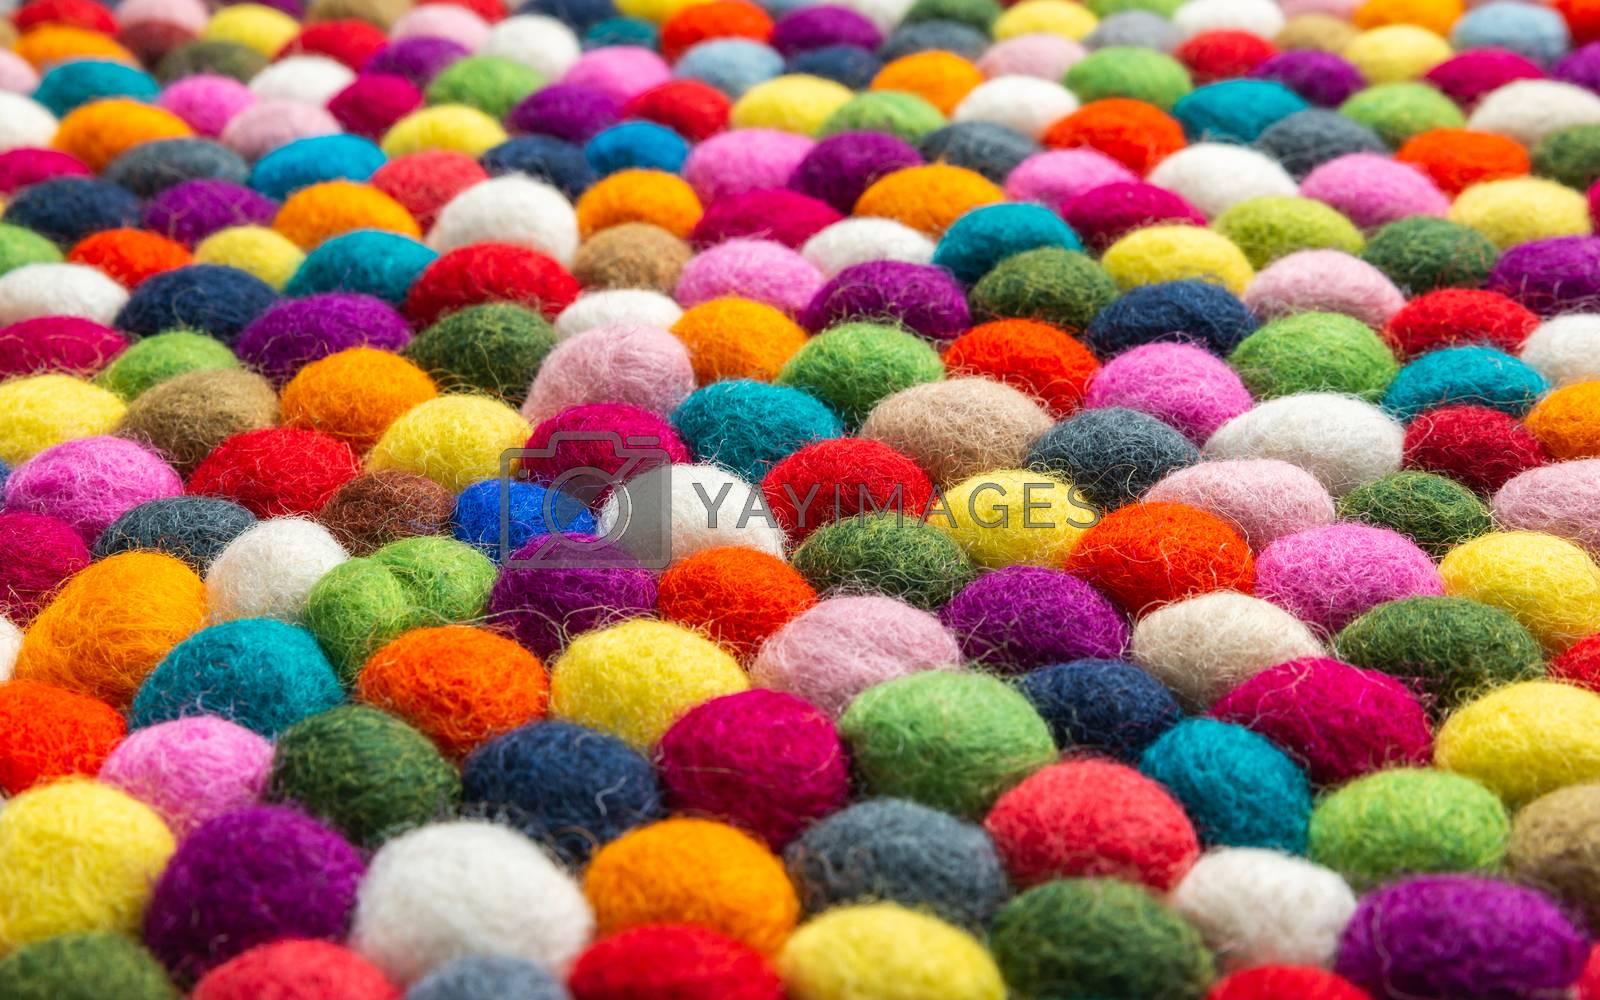 Multicolored felt ball rug detail by Thomas Dutour